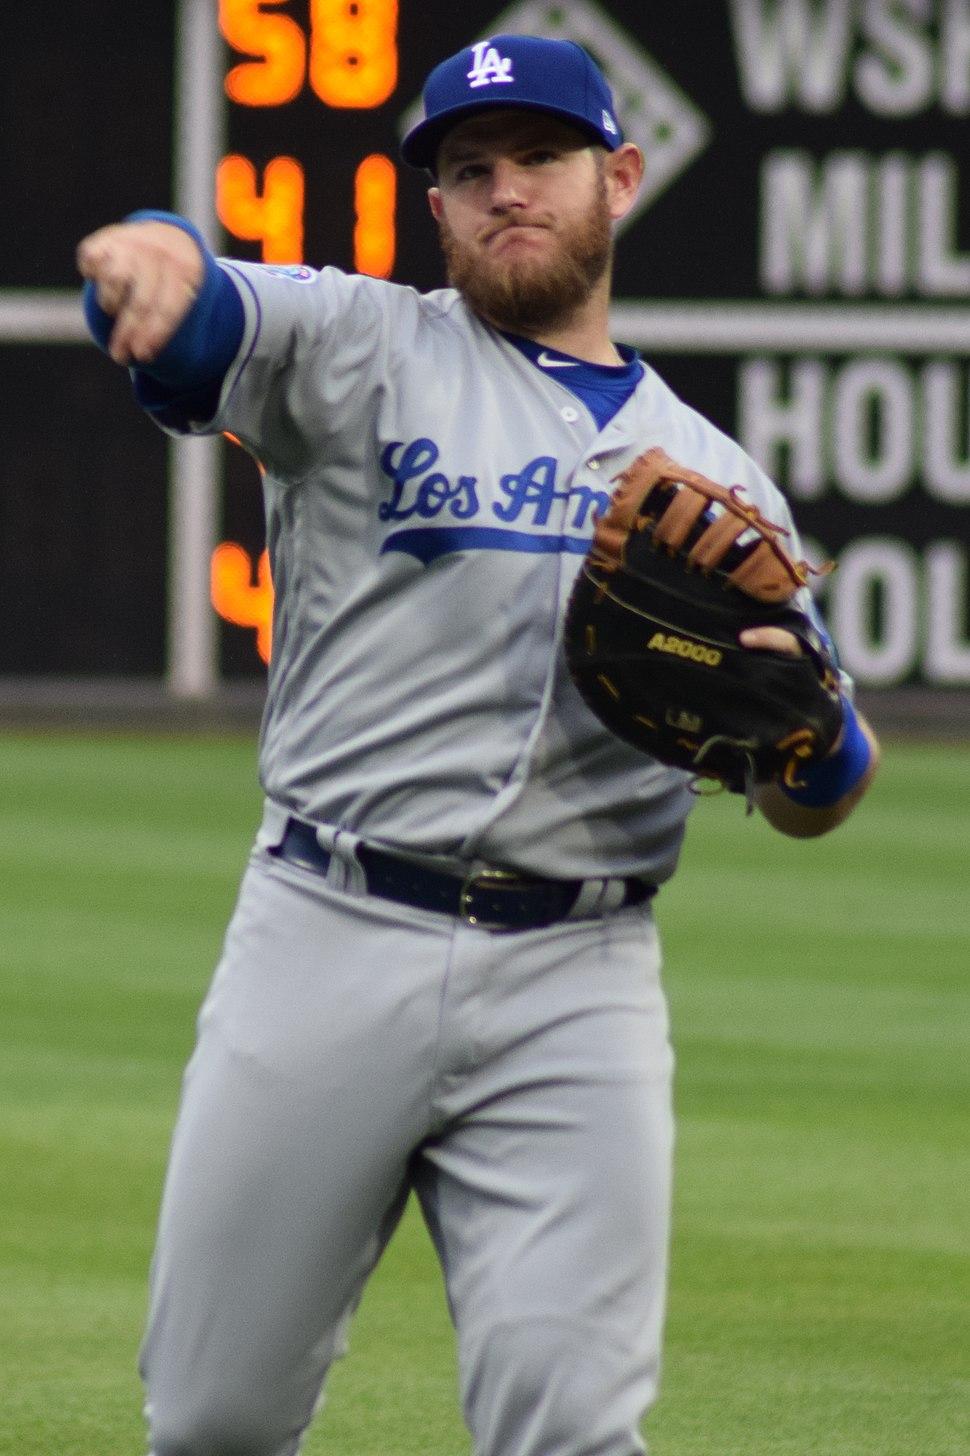 Max Muncy LA Dodgers 2018 (cropped)